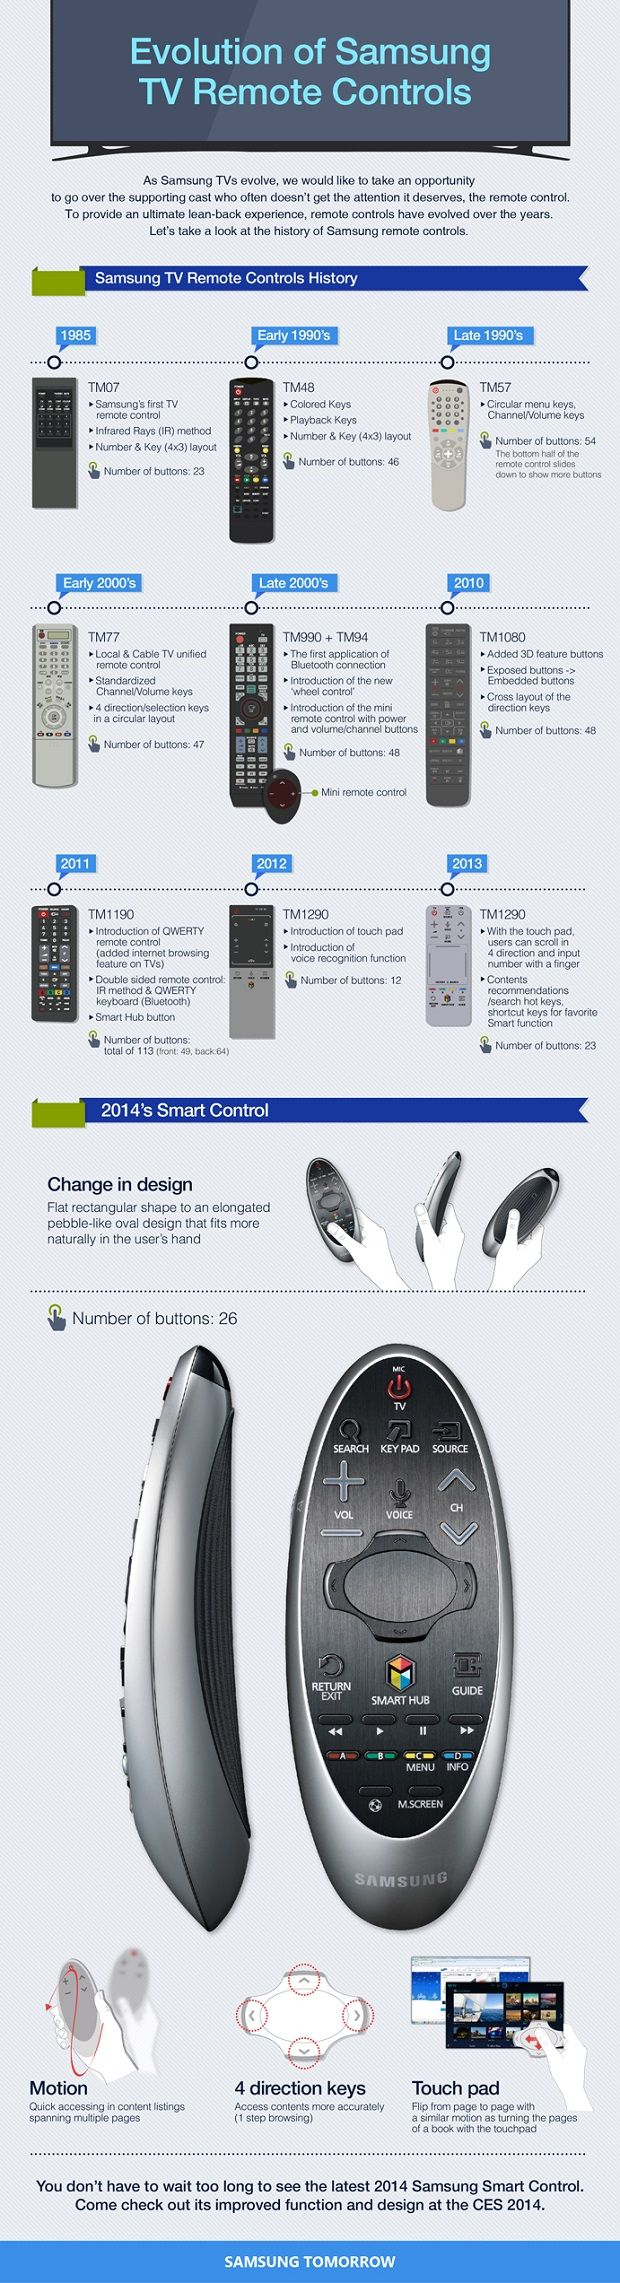 Samsung 2014 年新電視遙控:小了 80%,支援觸控、聲控和動作控制